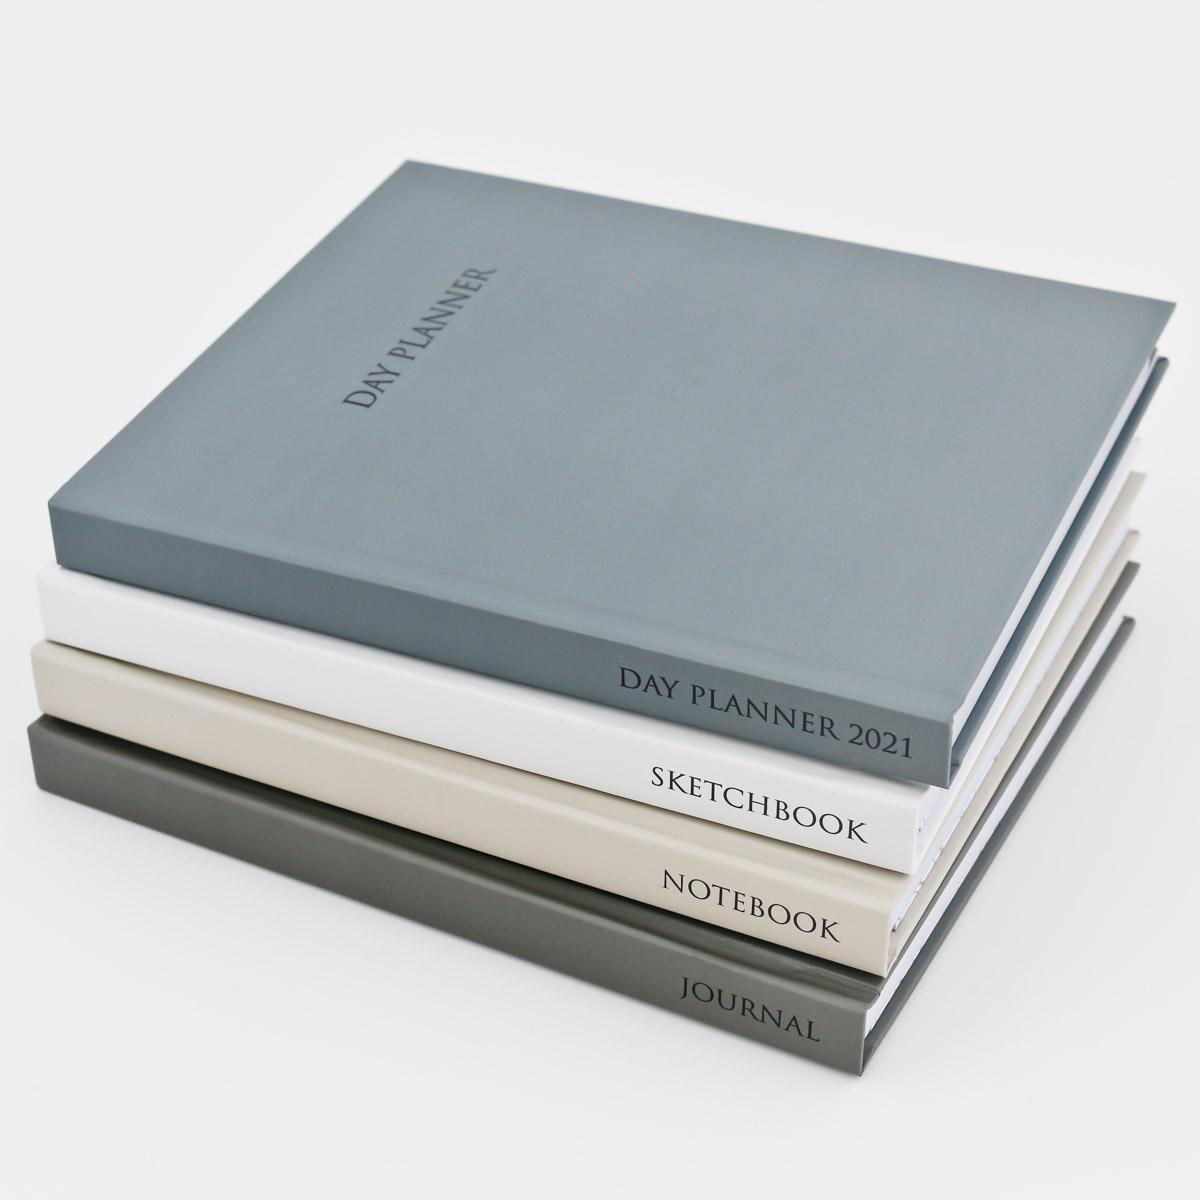 The tidbits notebook, journal and sketchbook bundle